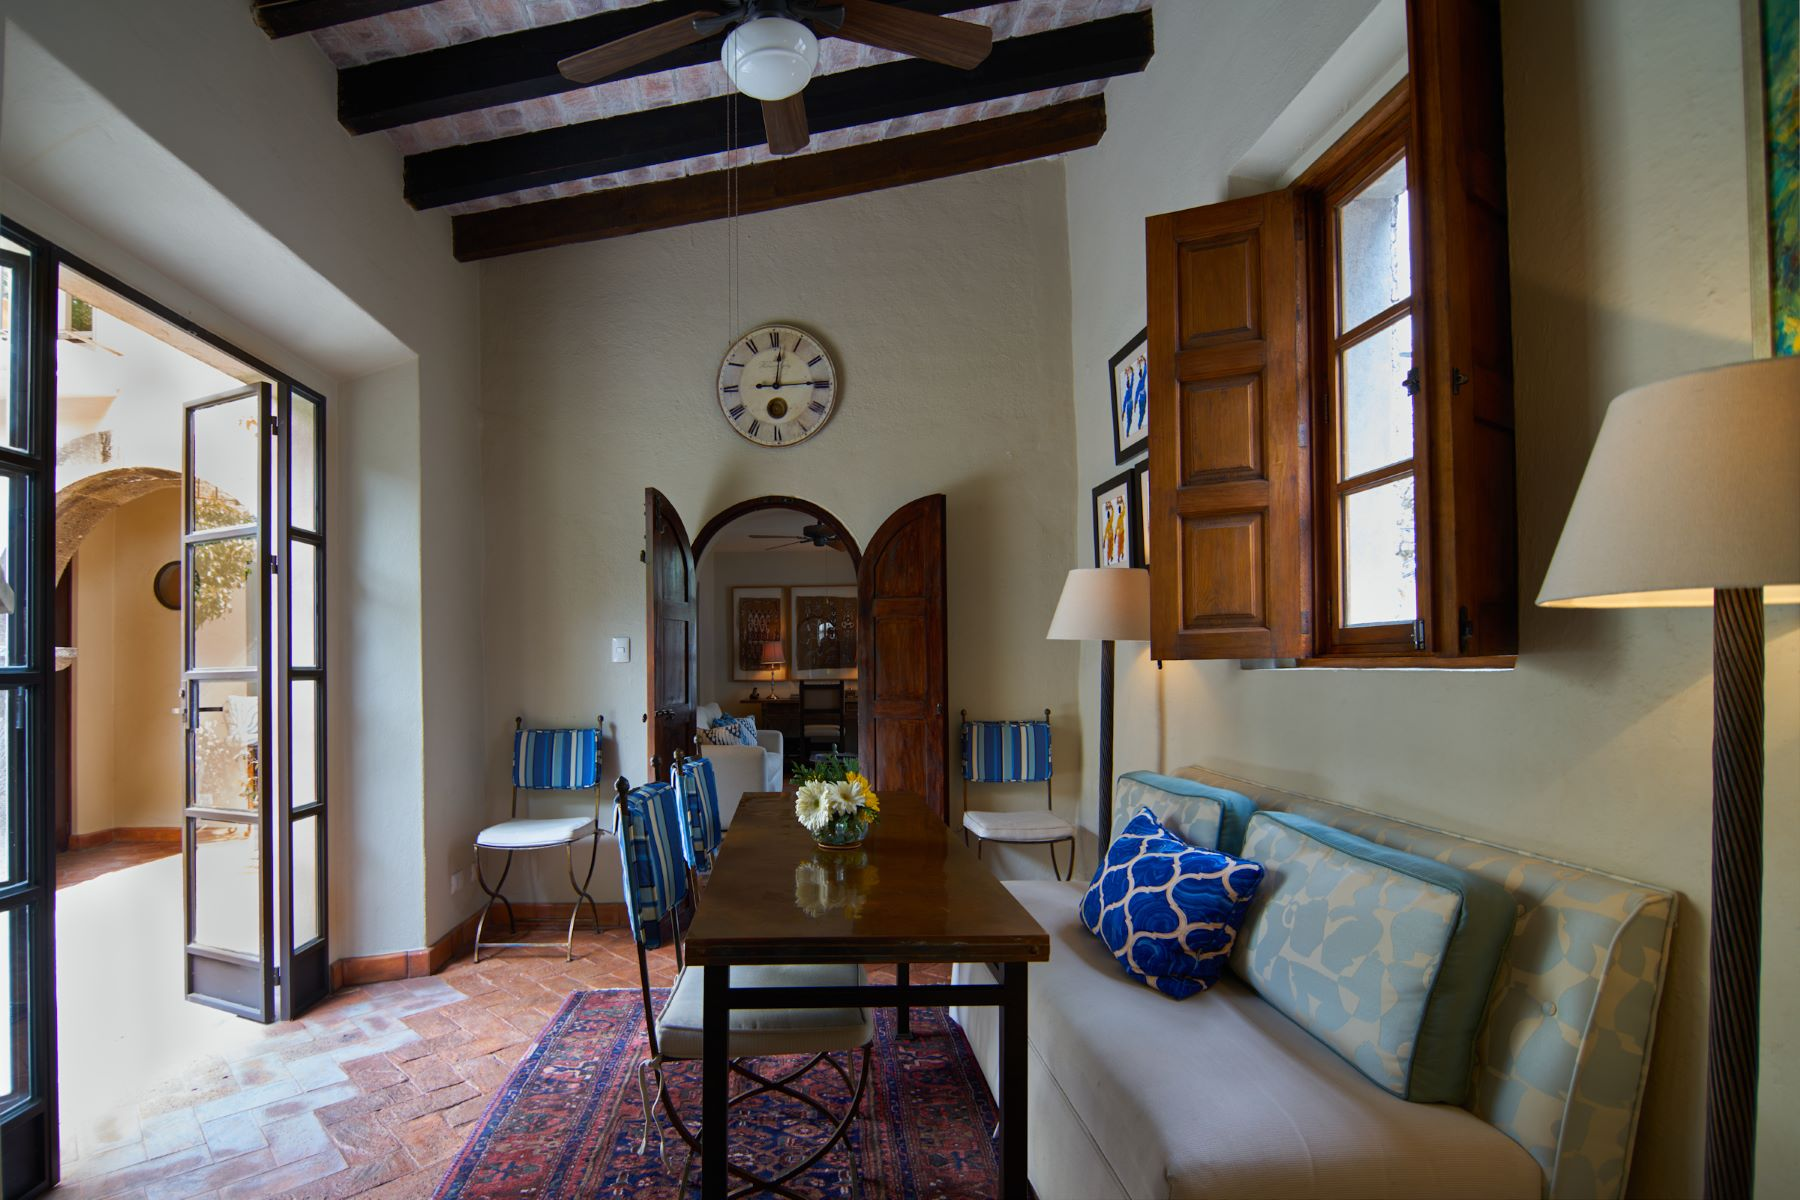 Additional photo for property listing at CASA CALVARIO Centro, San Miguel De Allende, Guanajuato Mexico